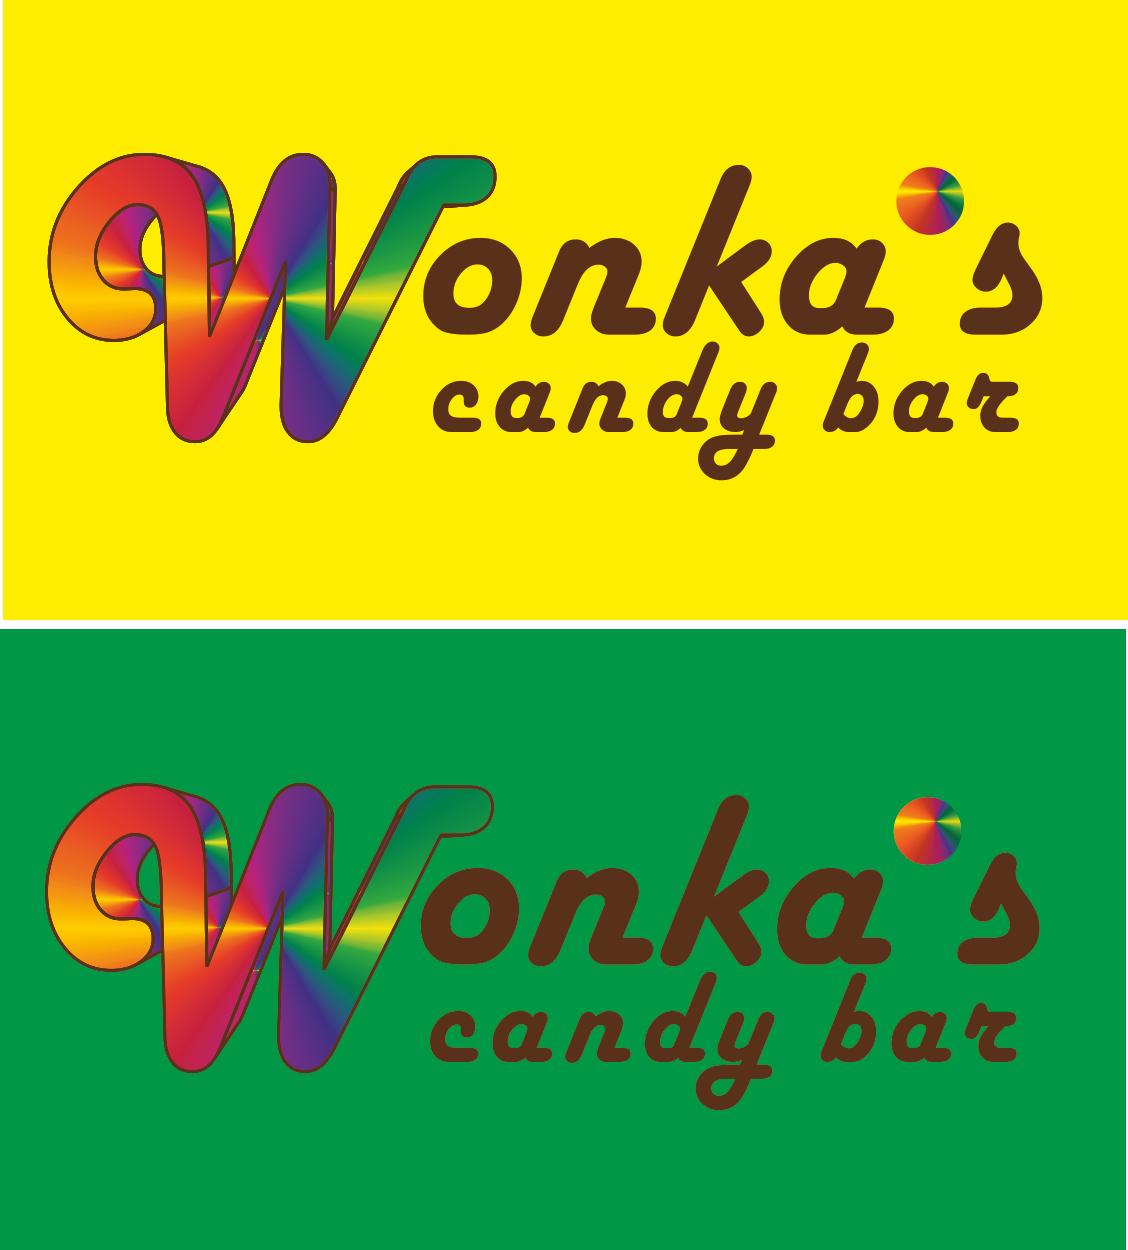 Разработка логотипа магазина сладостей со всего мира. фото f_0655a280cb2738c3.png